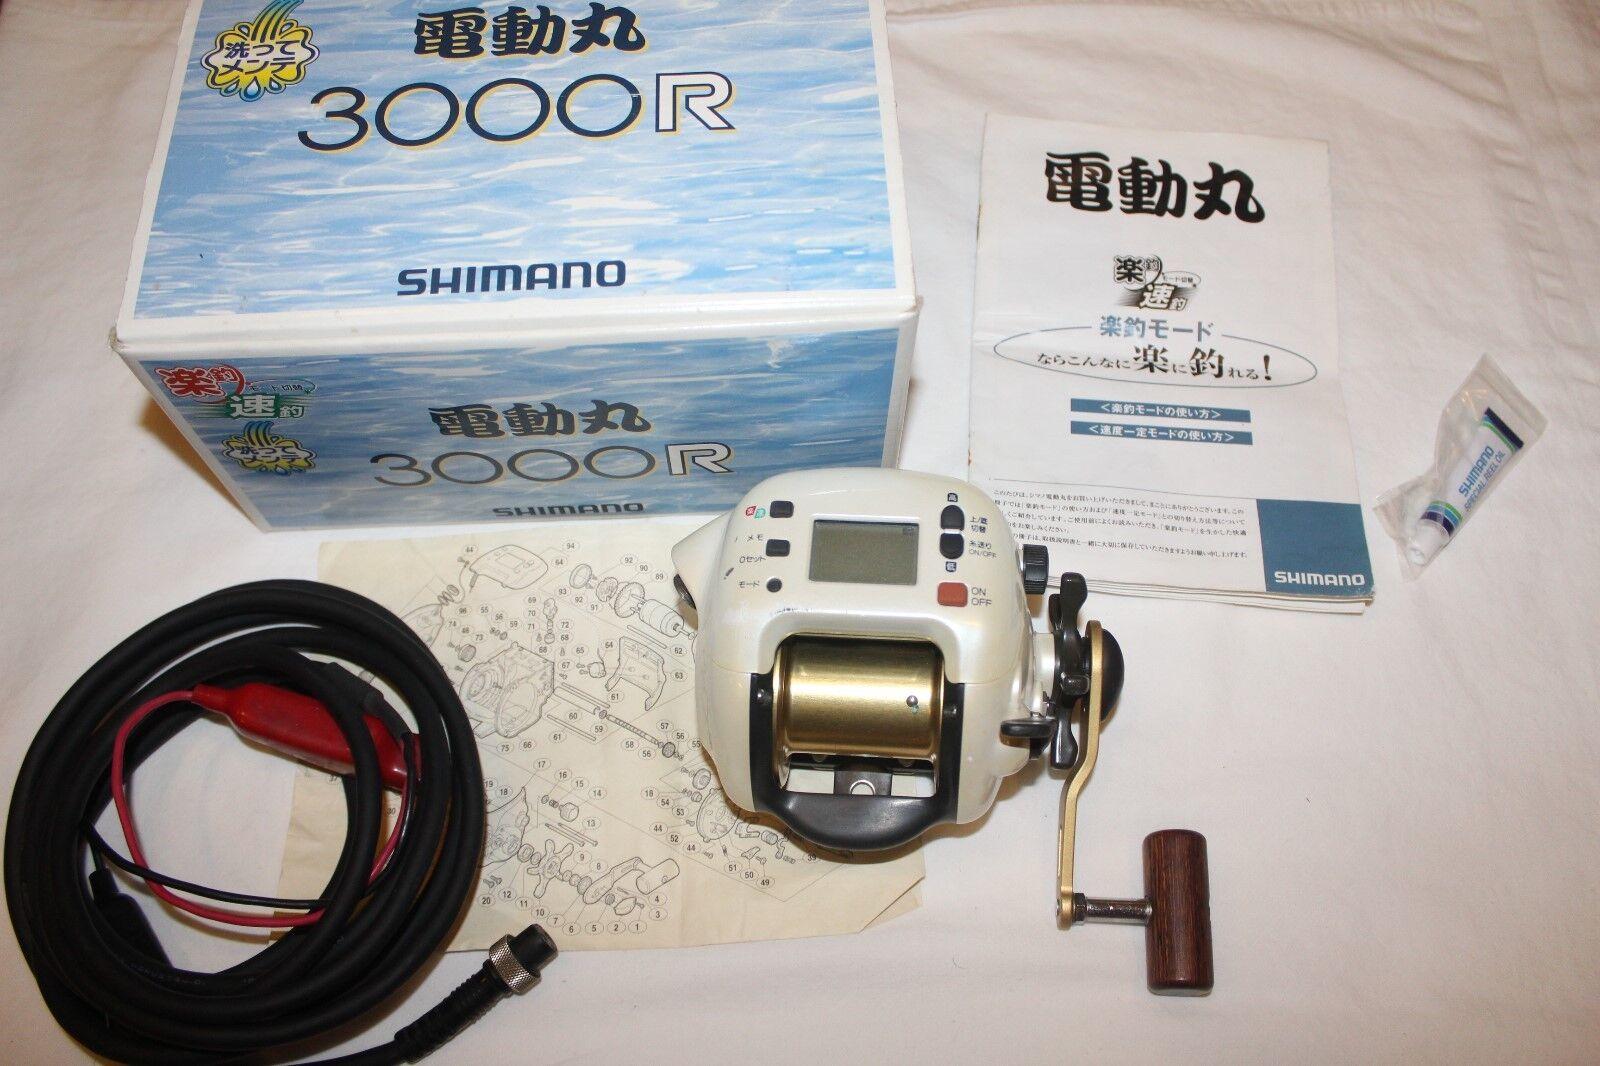 SHIMANO DENDOU-MARU 3000 3000 DENDOU-MARU R IM OVP-ELEKTROROLLE-MADE IN JAPAN-Nr-861 2a12bc